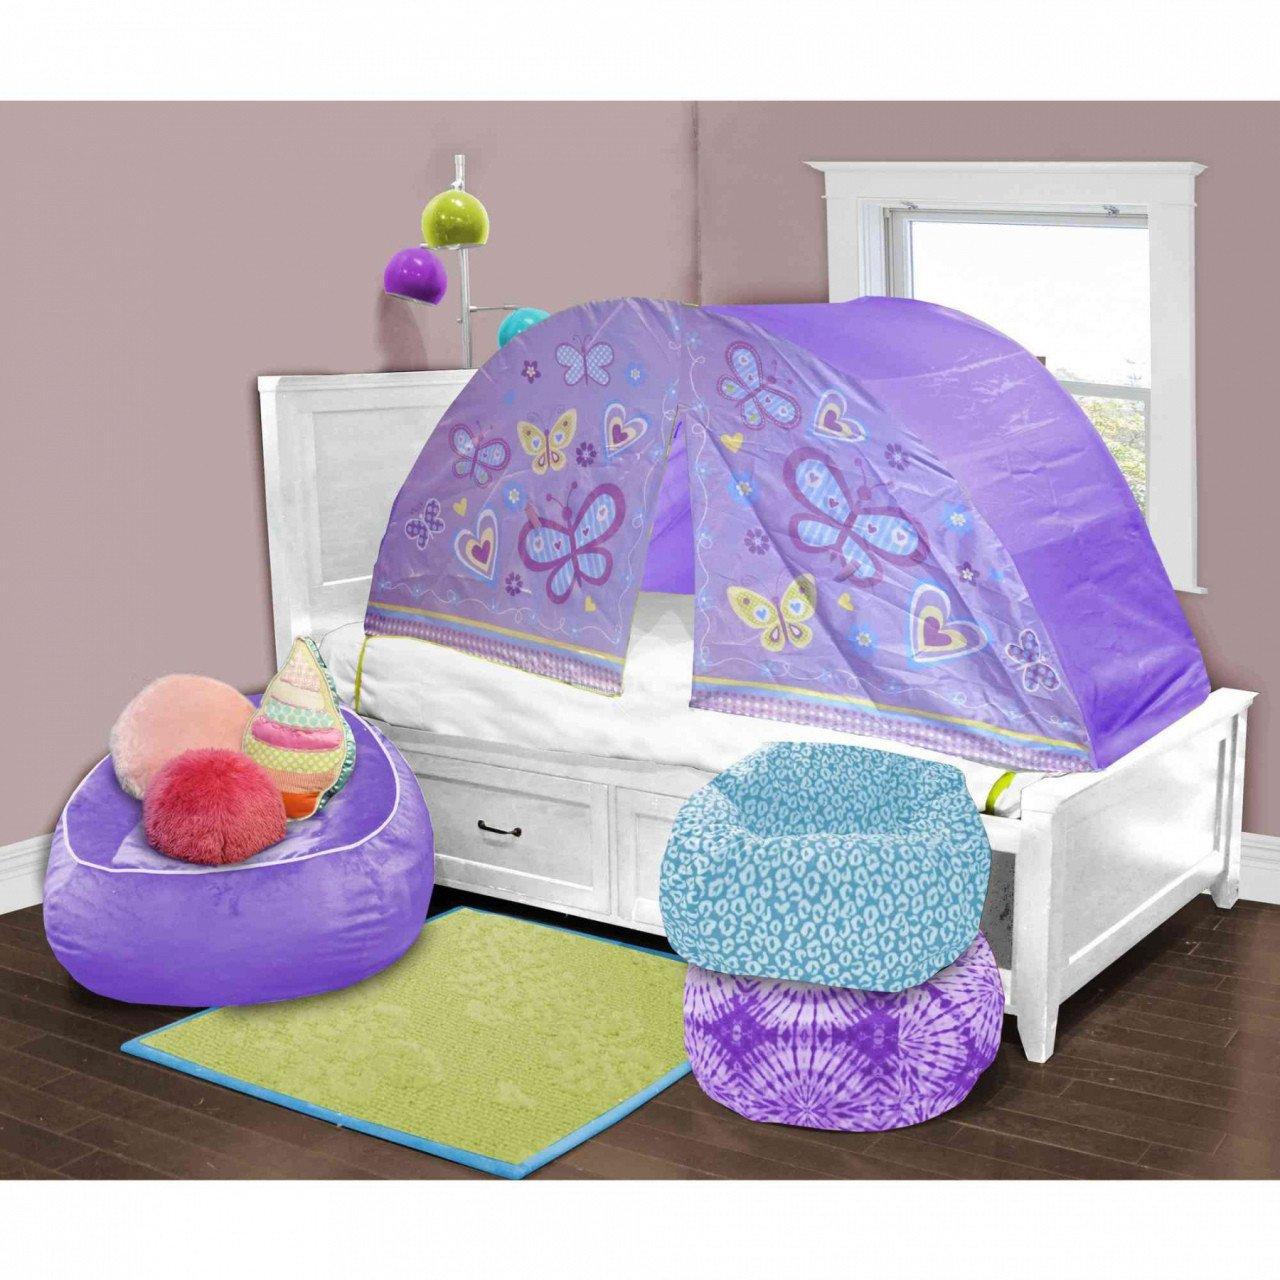 Cool Boy Bedroom Ideas New Kids Room Design Bedroom Ideas Ikea Kids Rooms Awesome